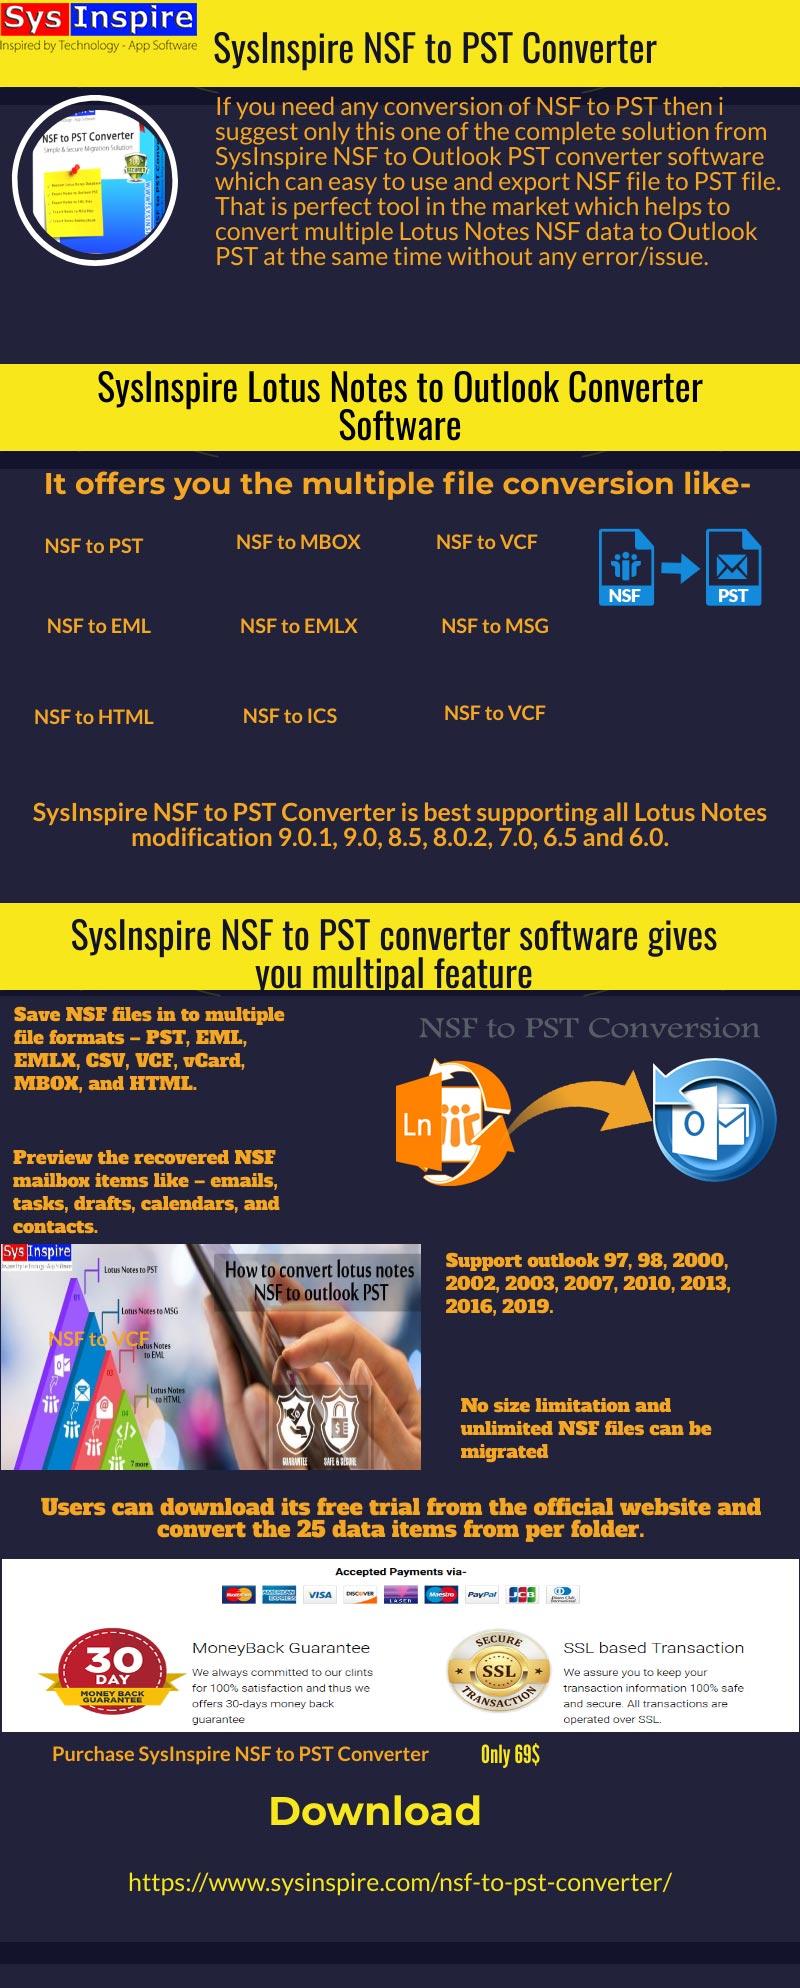 https://www.sysinspire.com/infographics/nsf/nsf-to-pst-converter.jpg